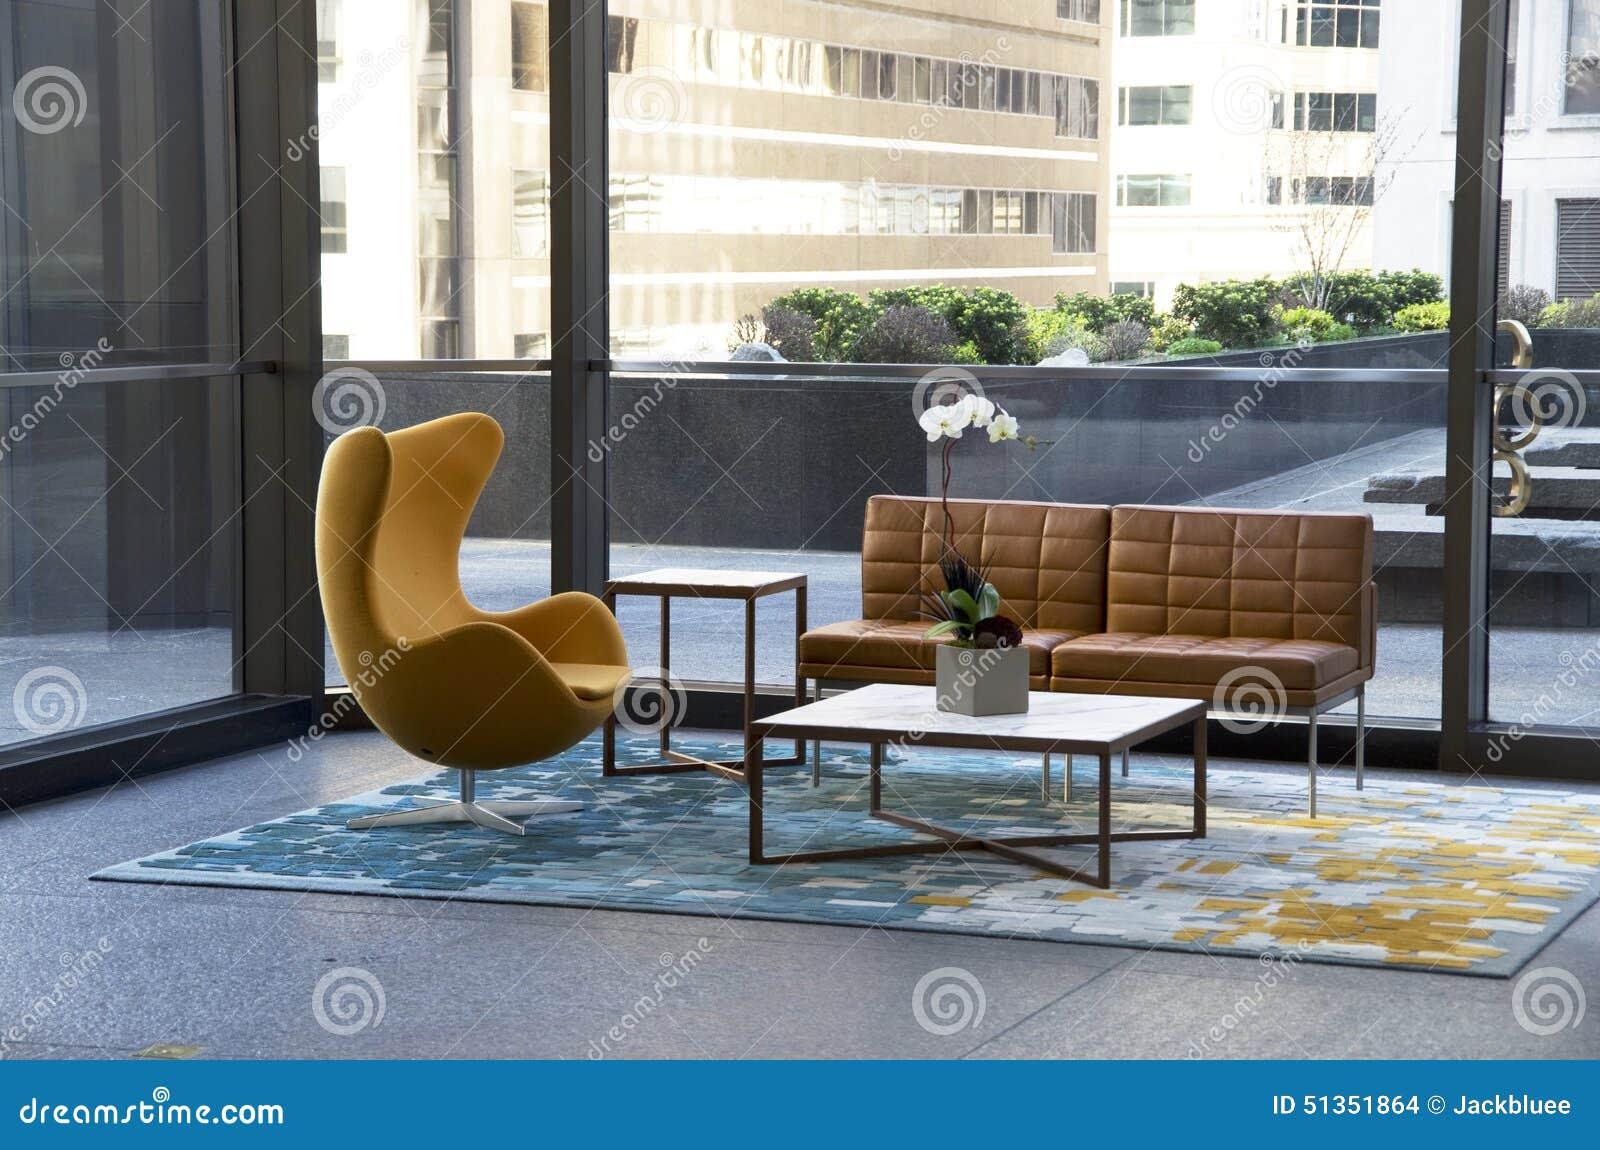 Furniture Store Clipart